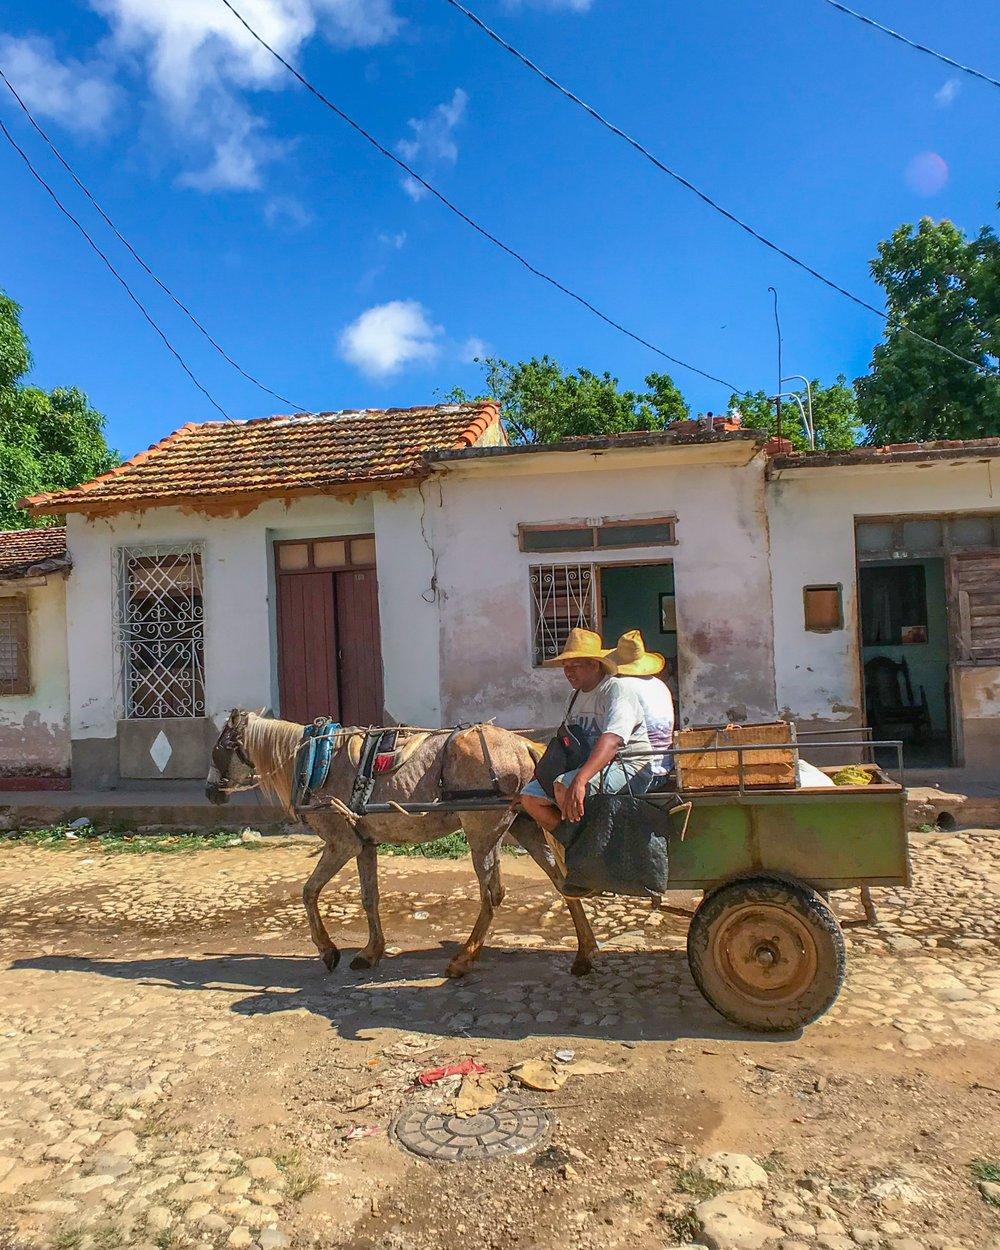 Typical street scene in Trinidad, Cuba